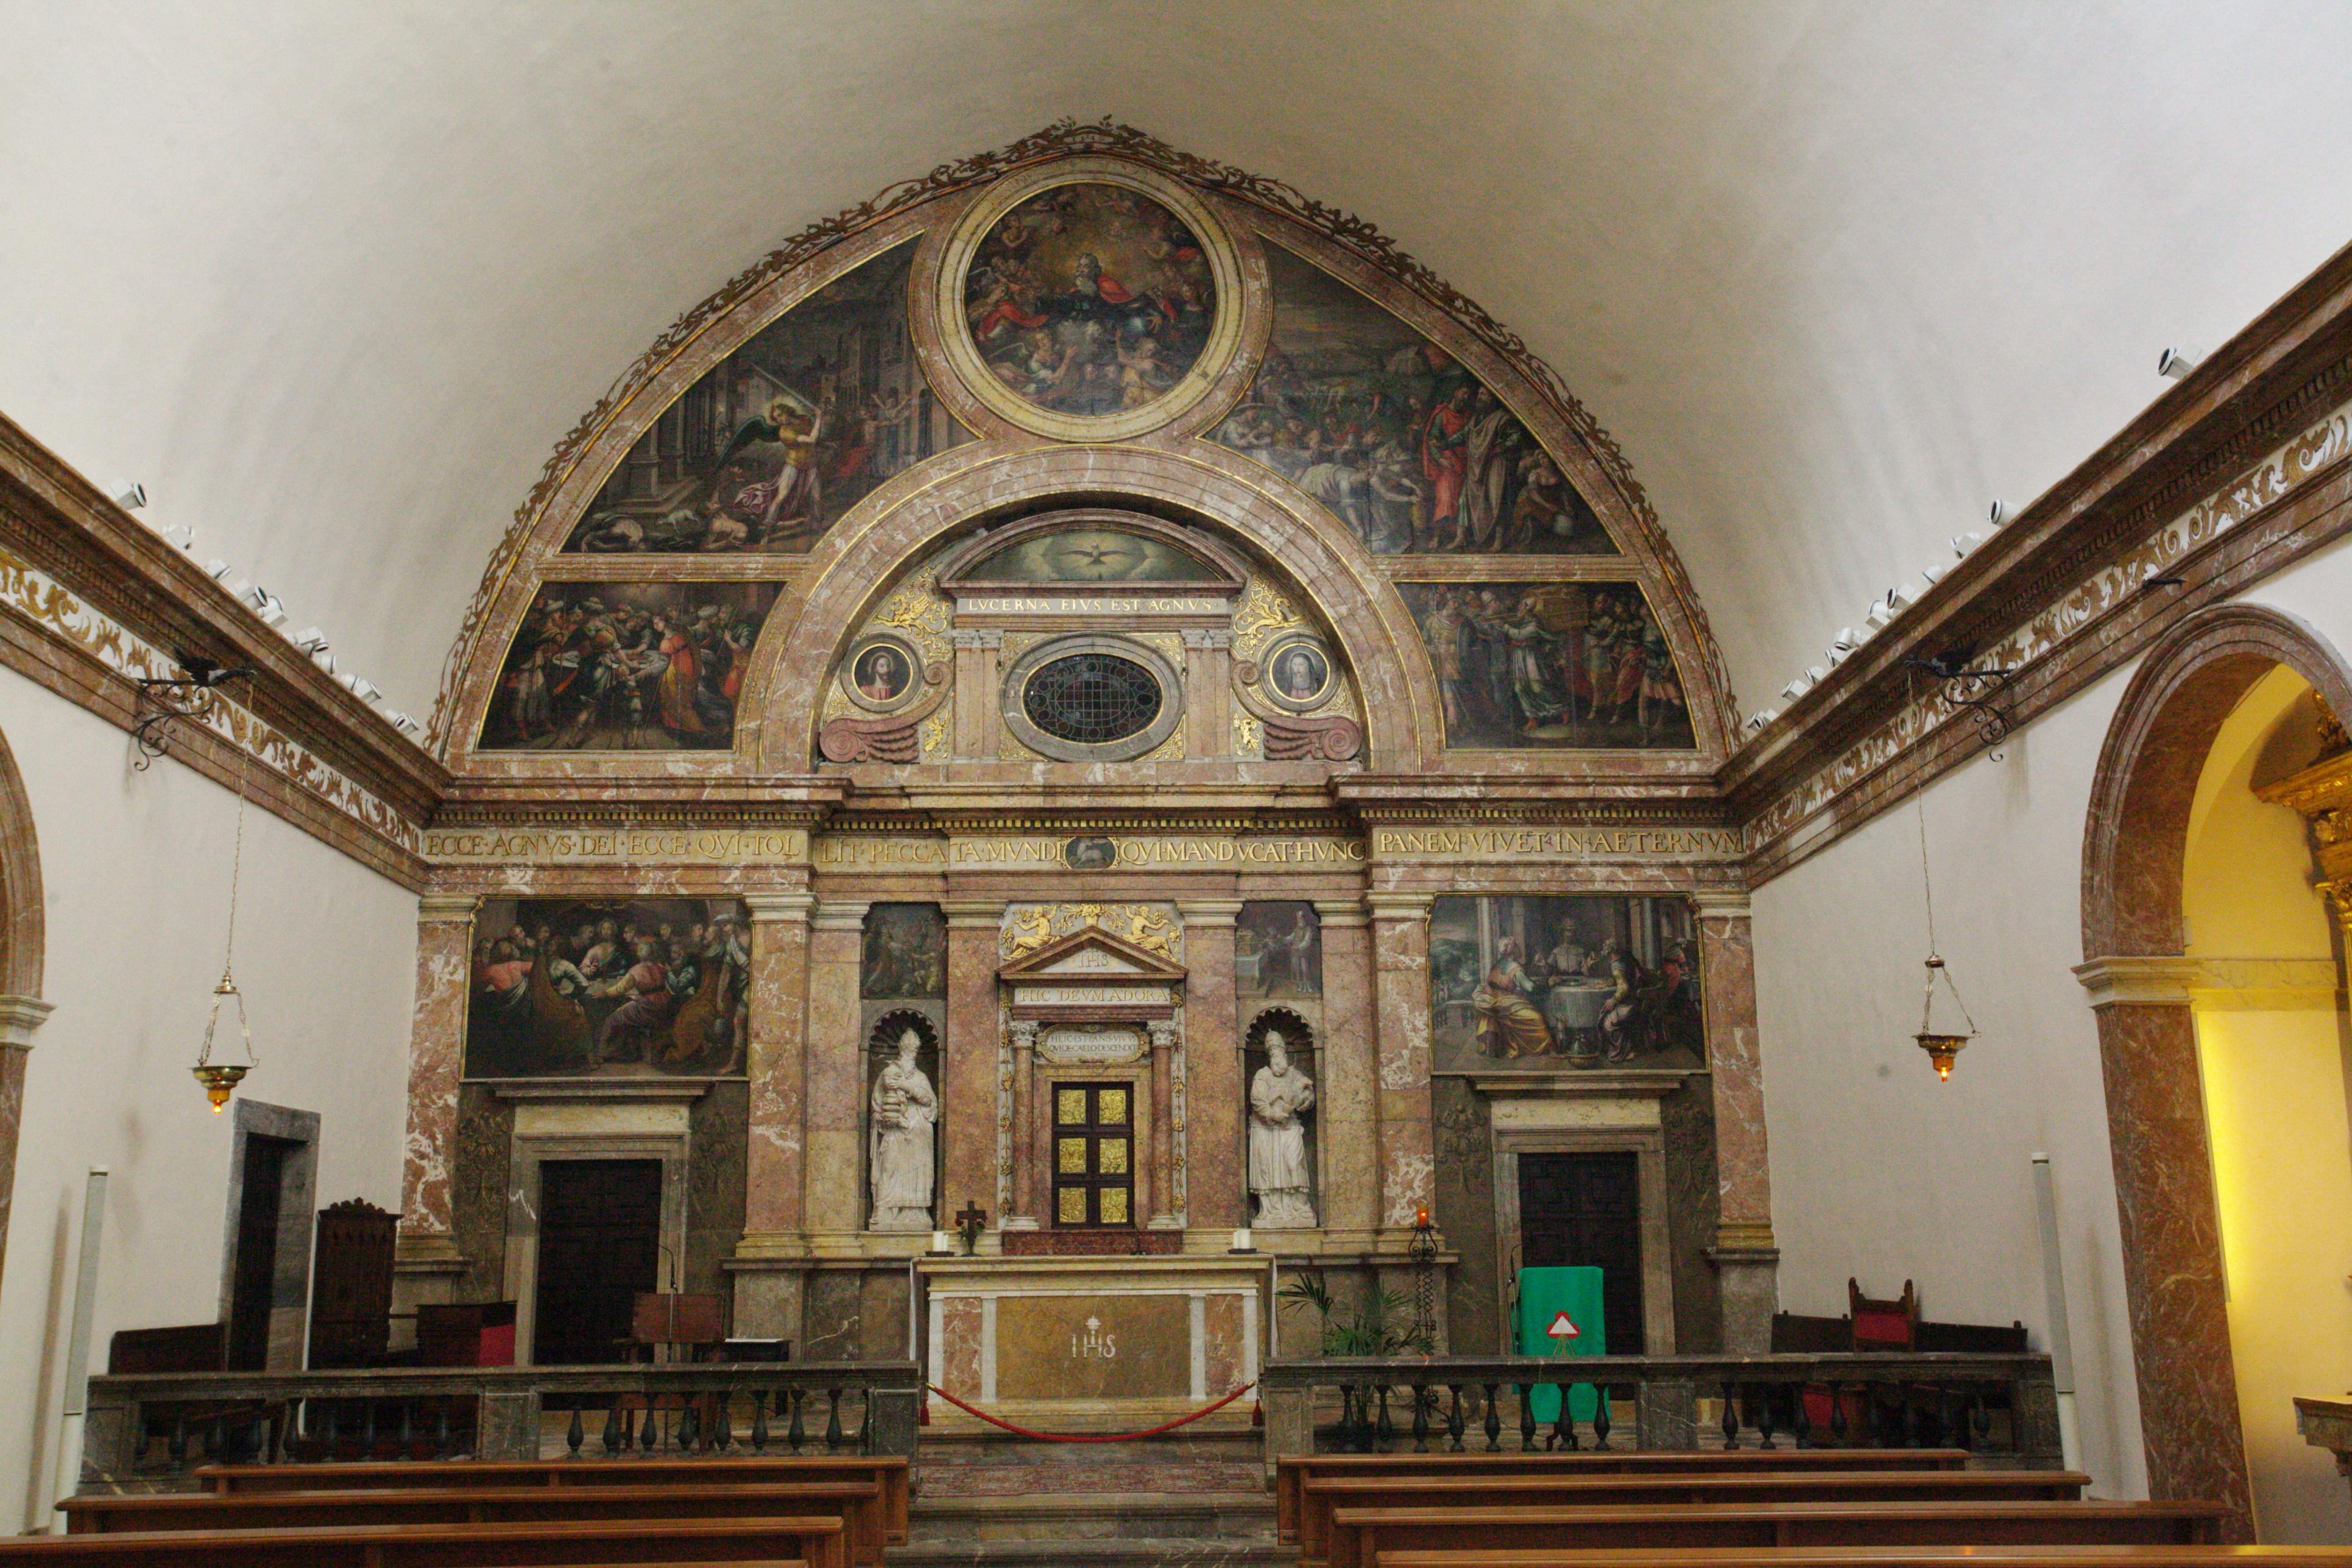 Capilla del Sagrario de la catedral de Tarragona